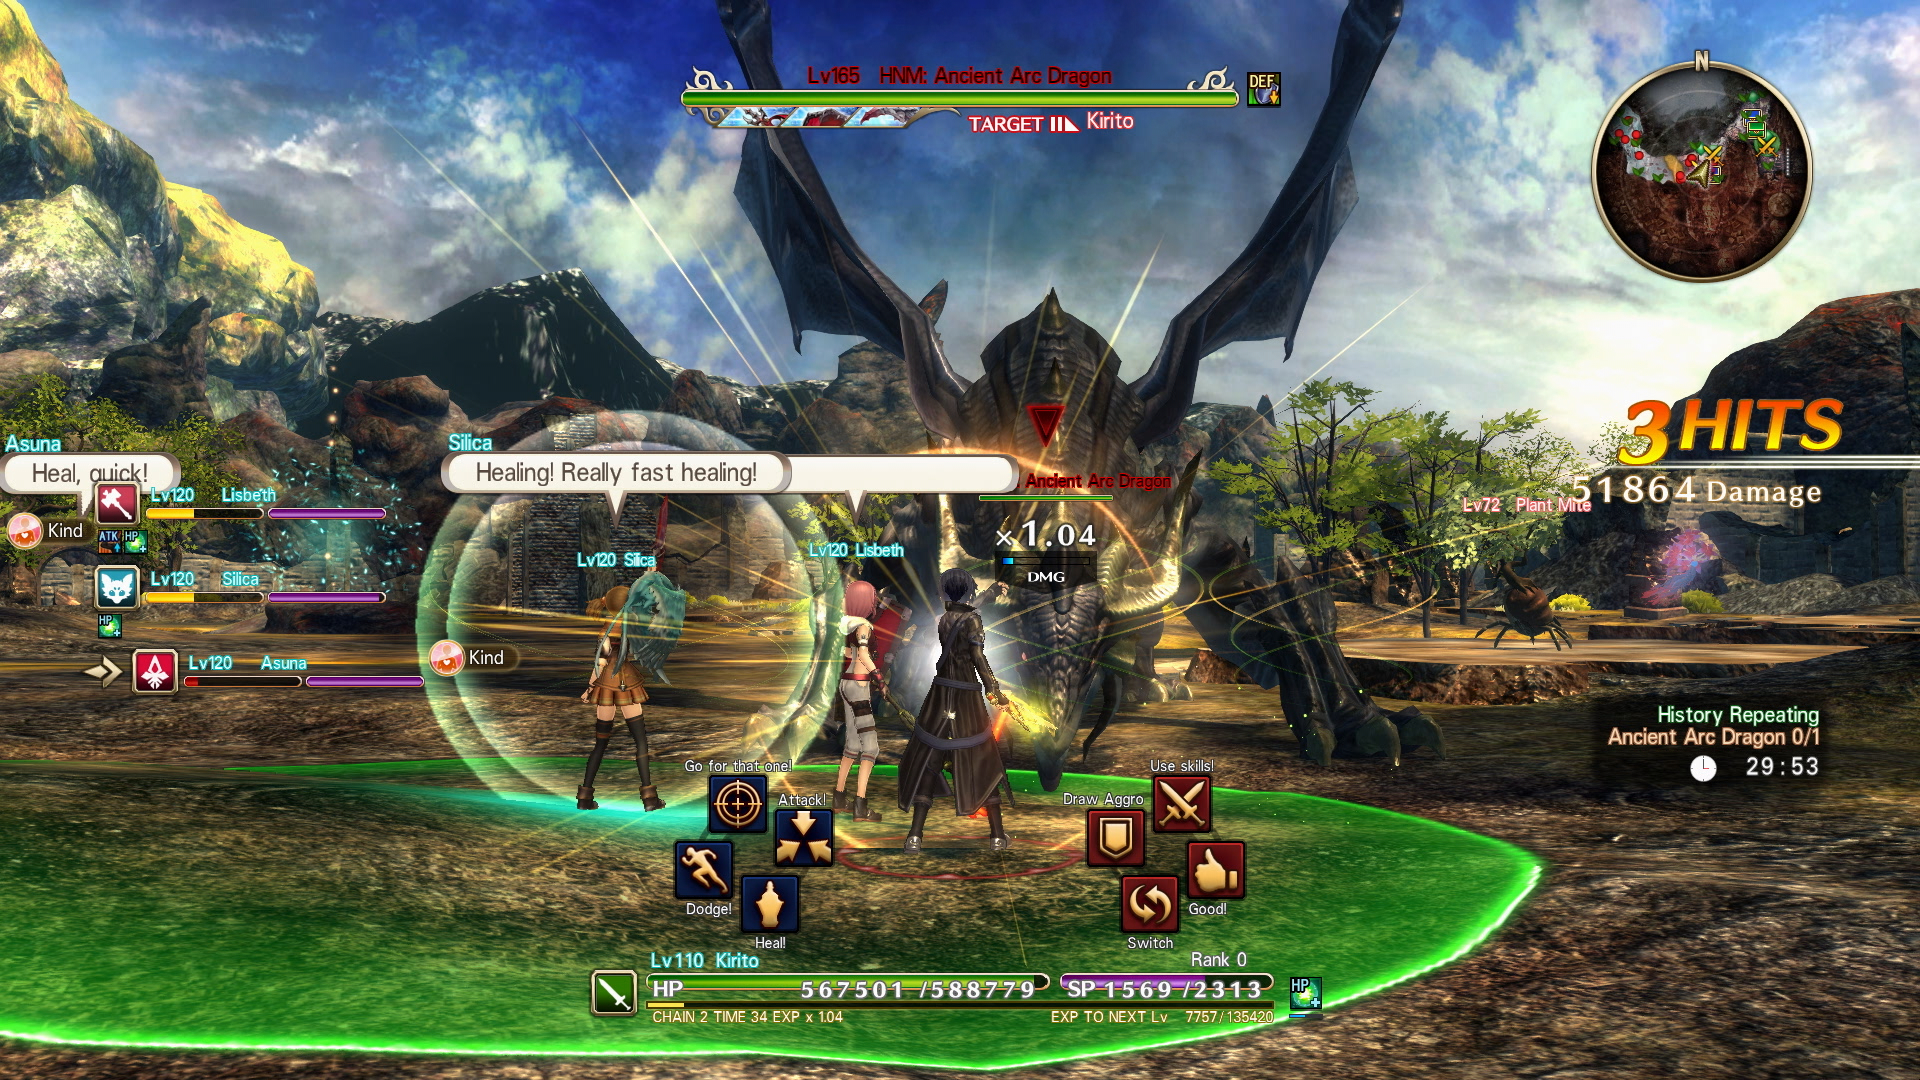 Sword Art Online: Hollow Realization Deluxe edition is